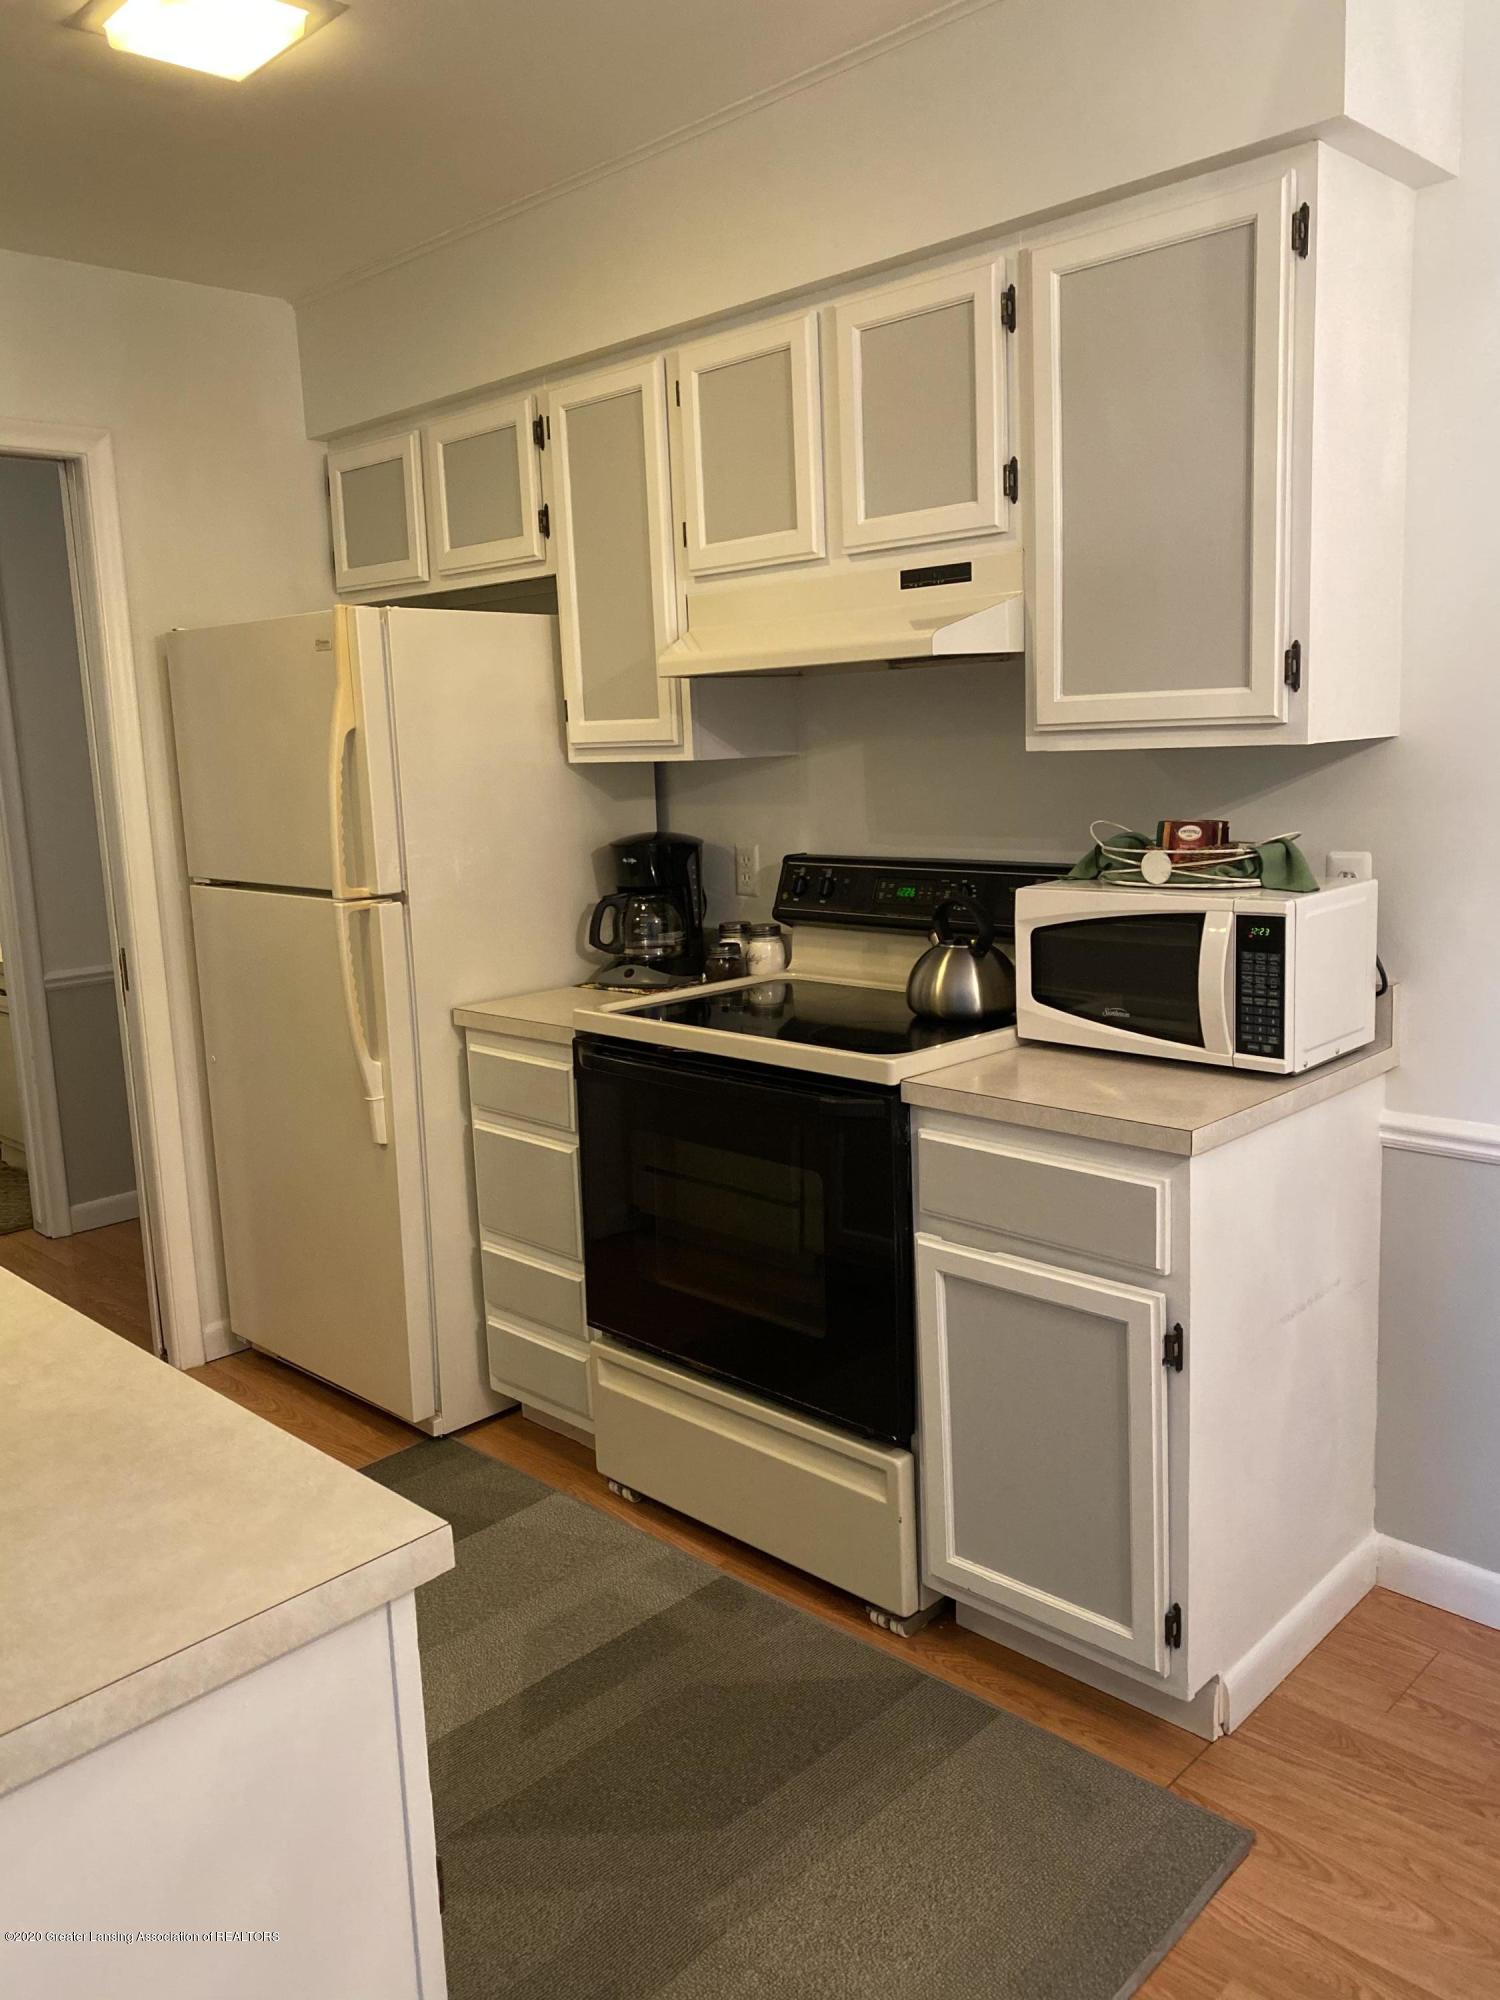 6164 Cobblers Dr APT 103 - Cobbler kitchen 2 - 9